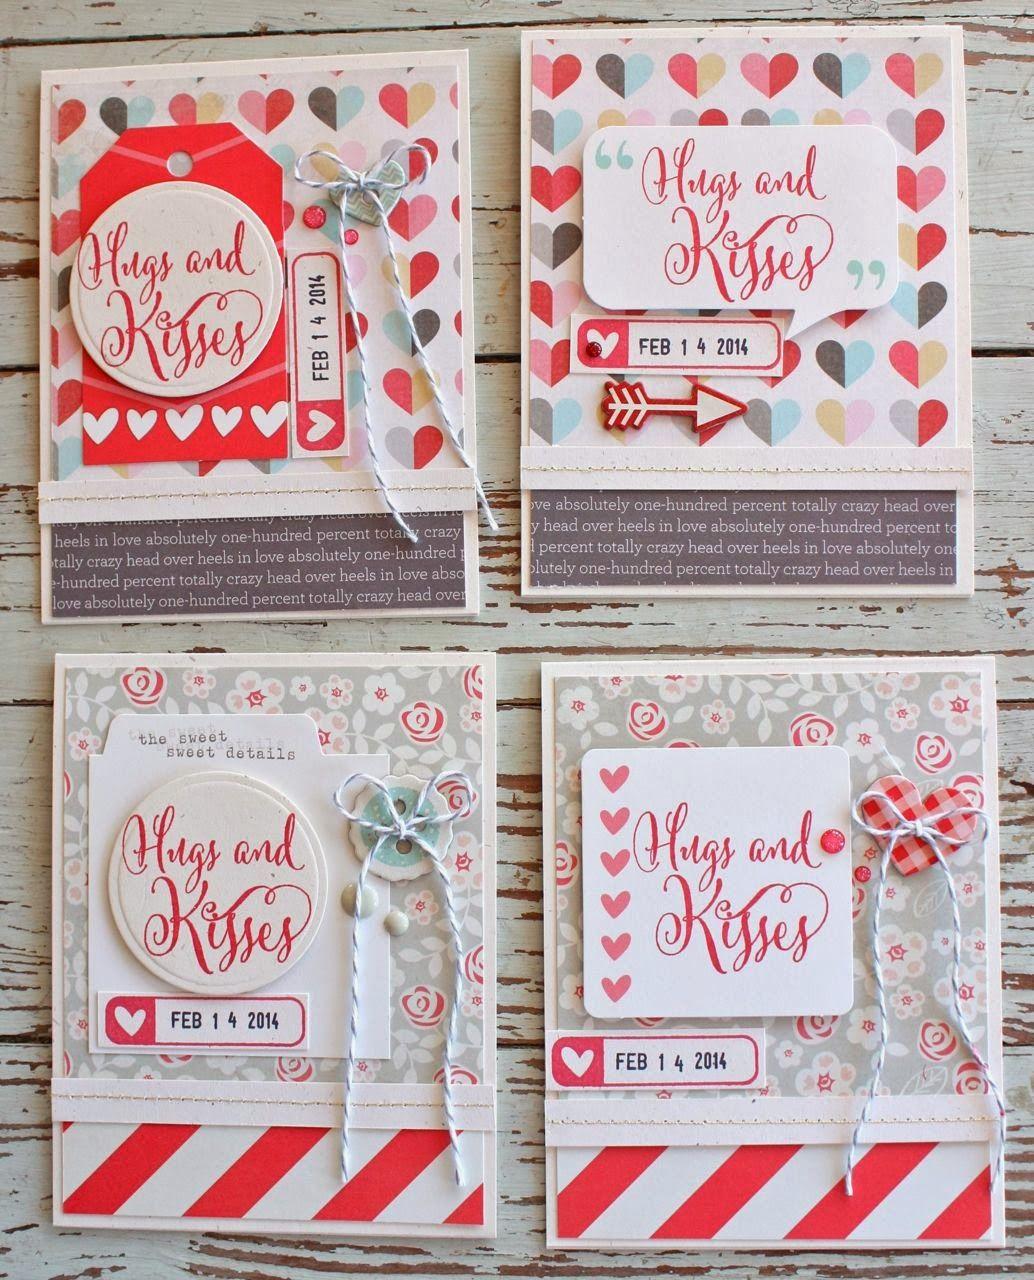 mish mash valentine's cards using gossamer blue february